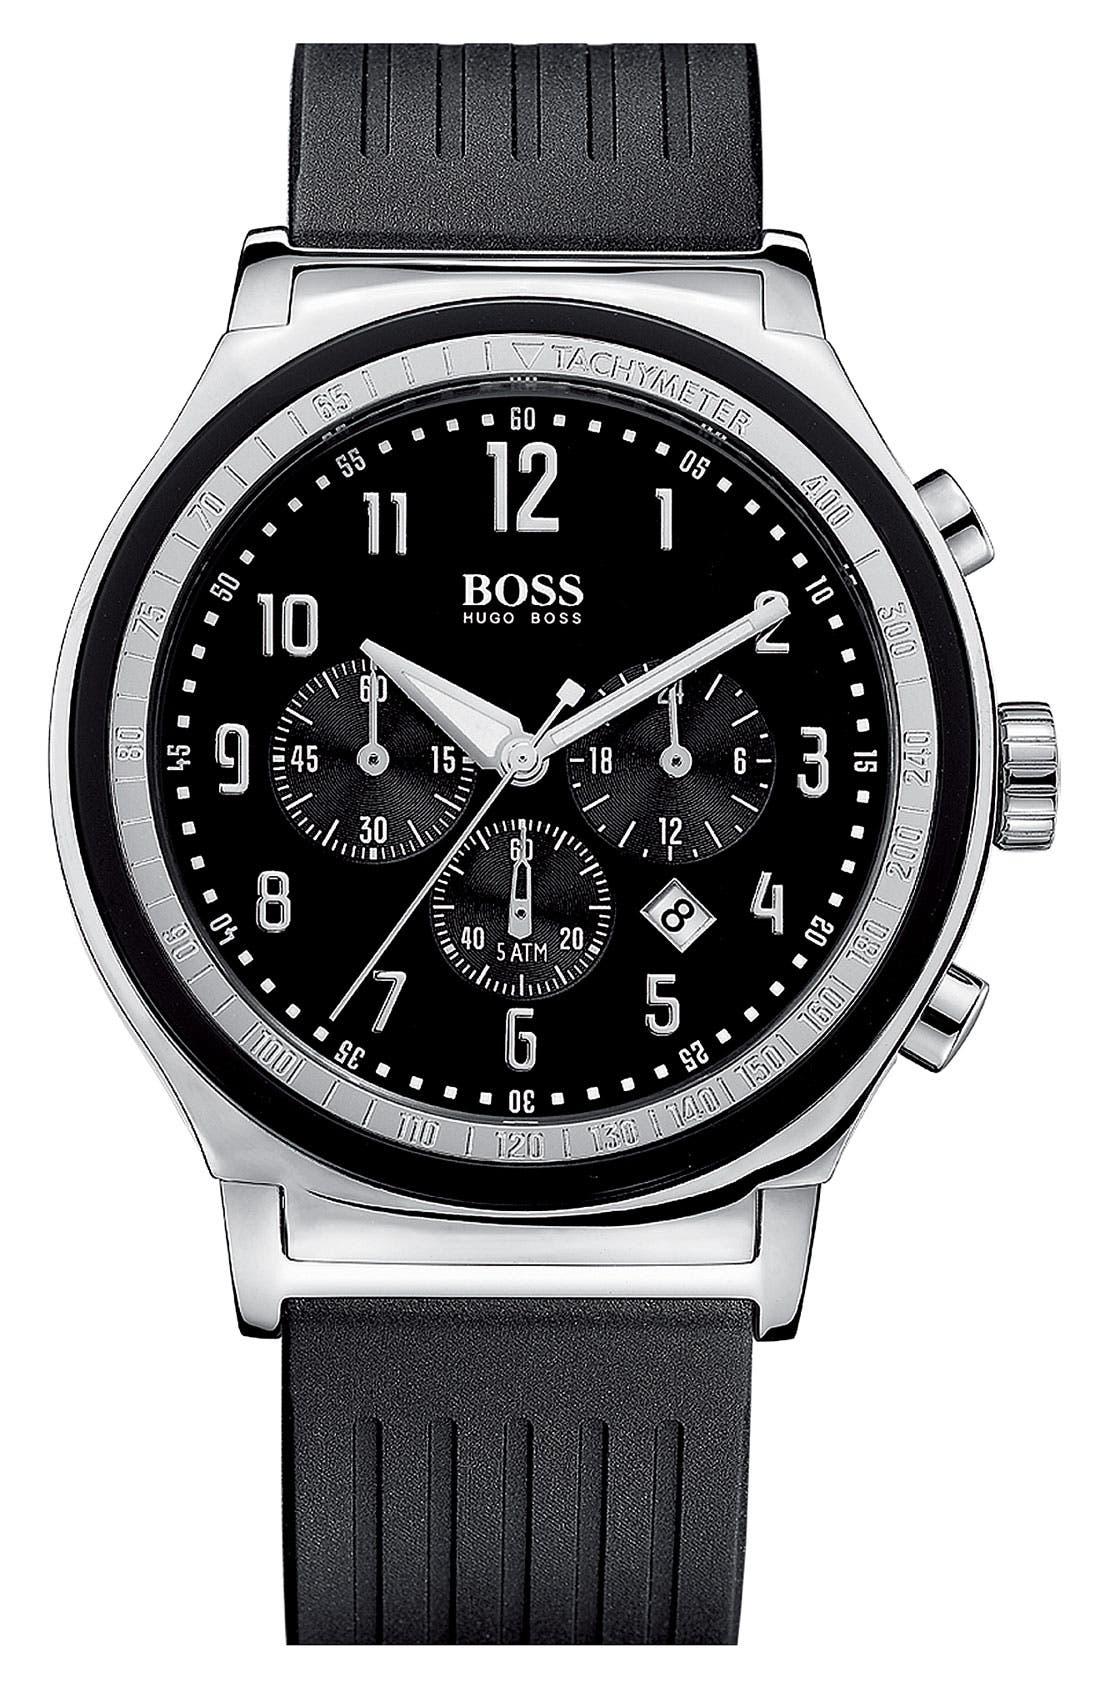 Main Image - BOSS HUGO BOSS Rubber Strap Chronograph Watch, 44mm